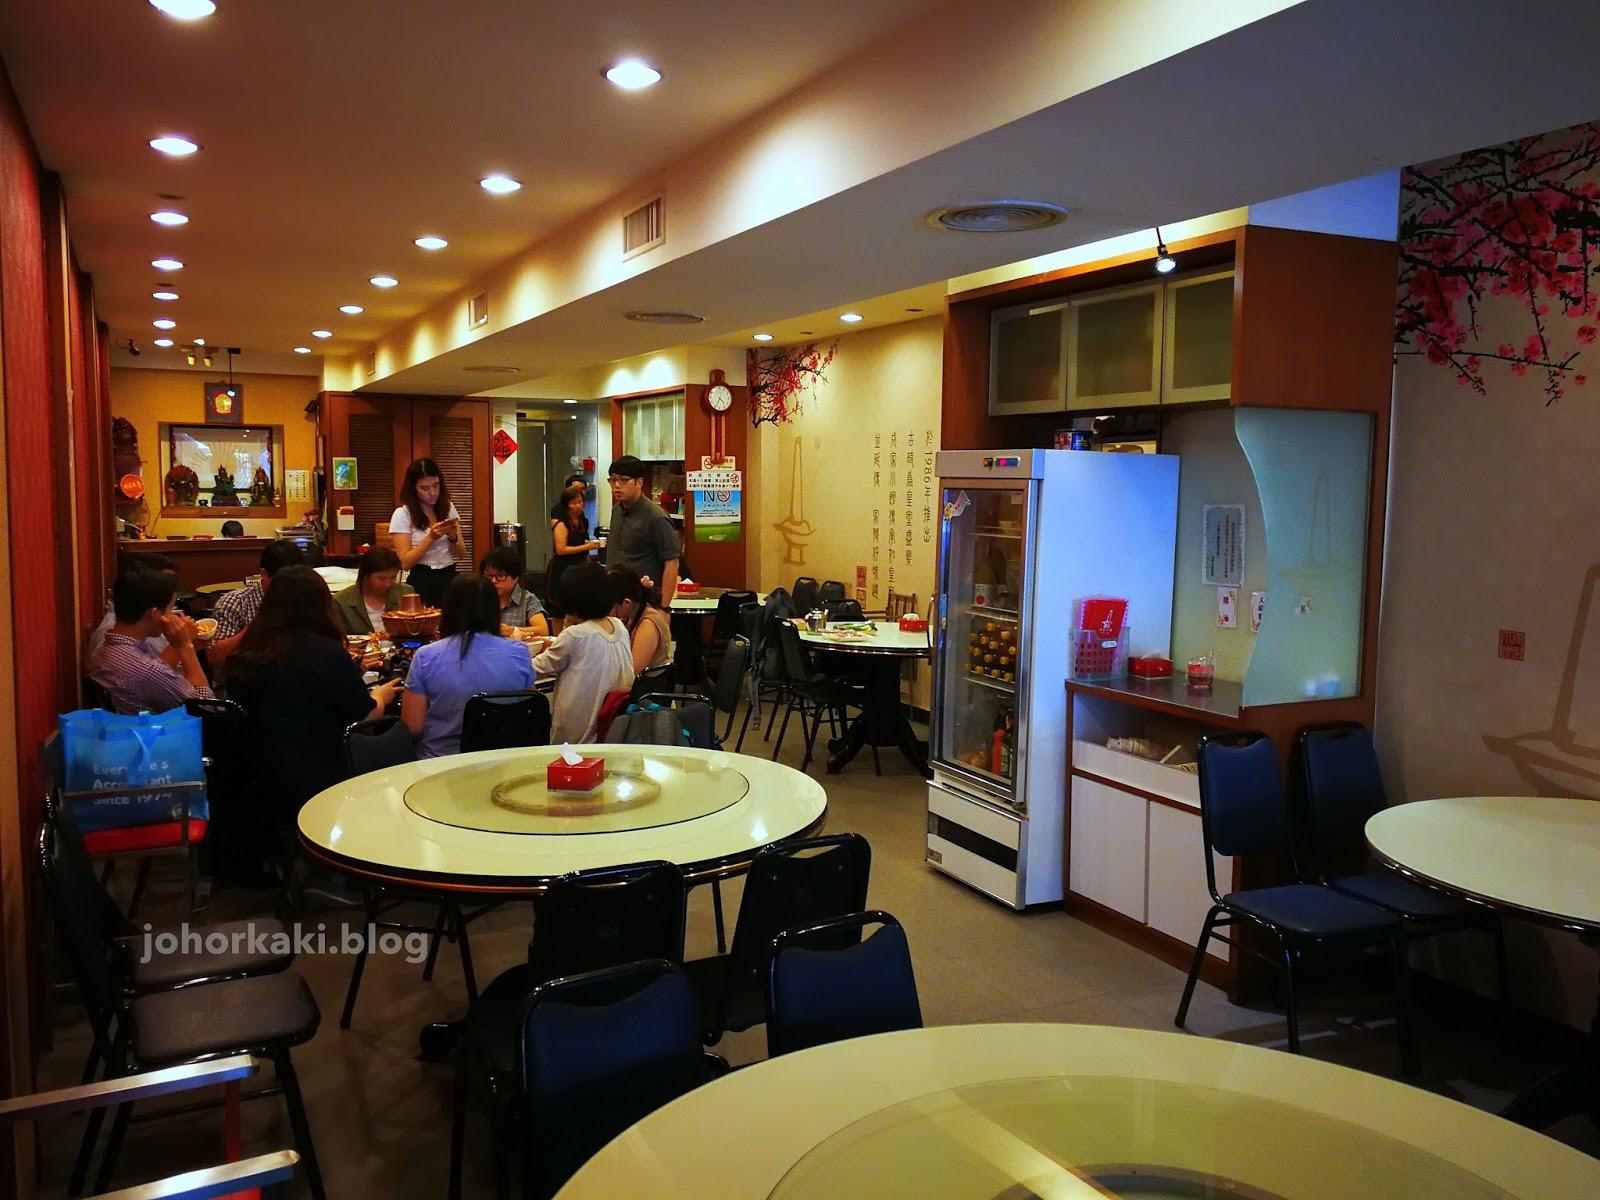 chen family restaurant taipei 成家小館木柵店台北 johor kaki